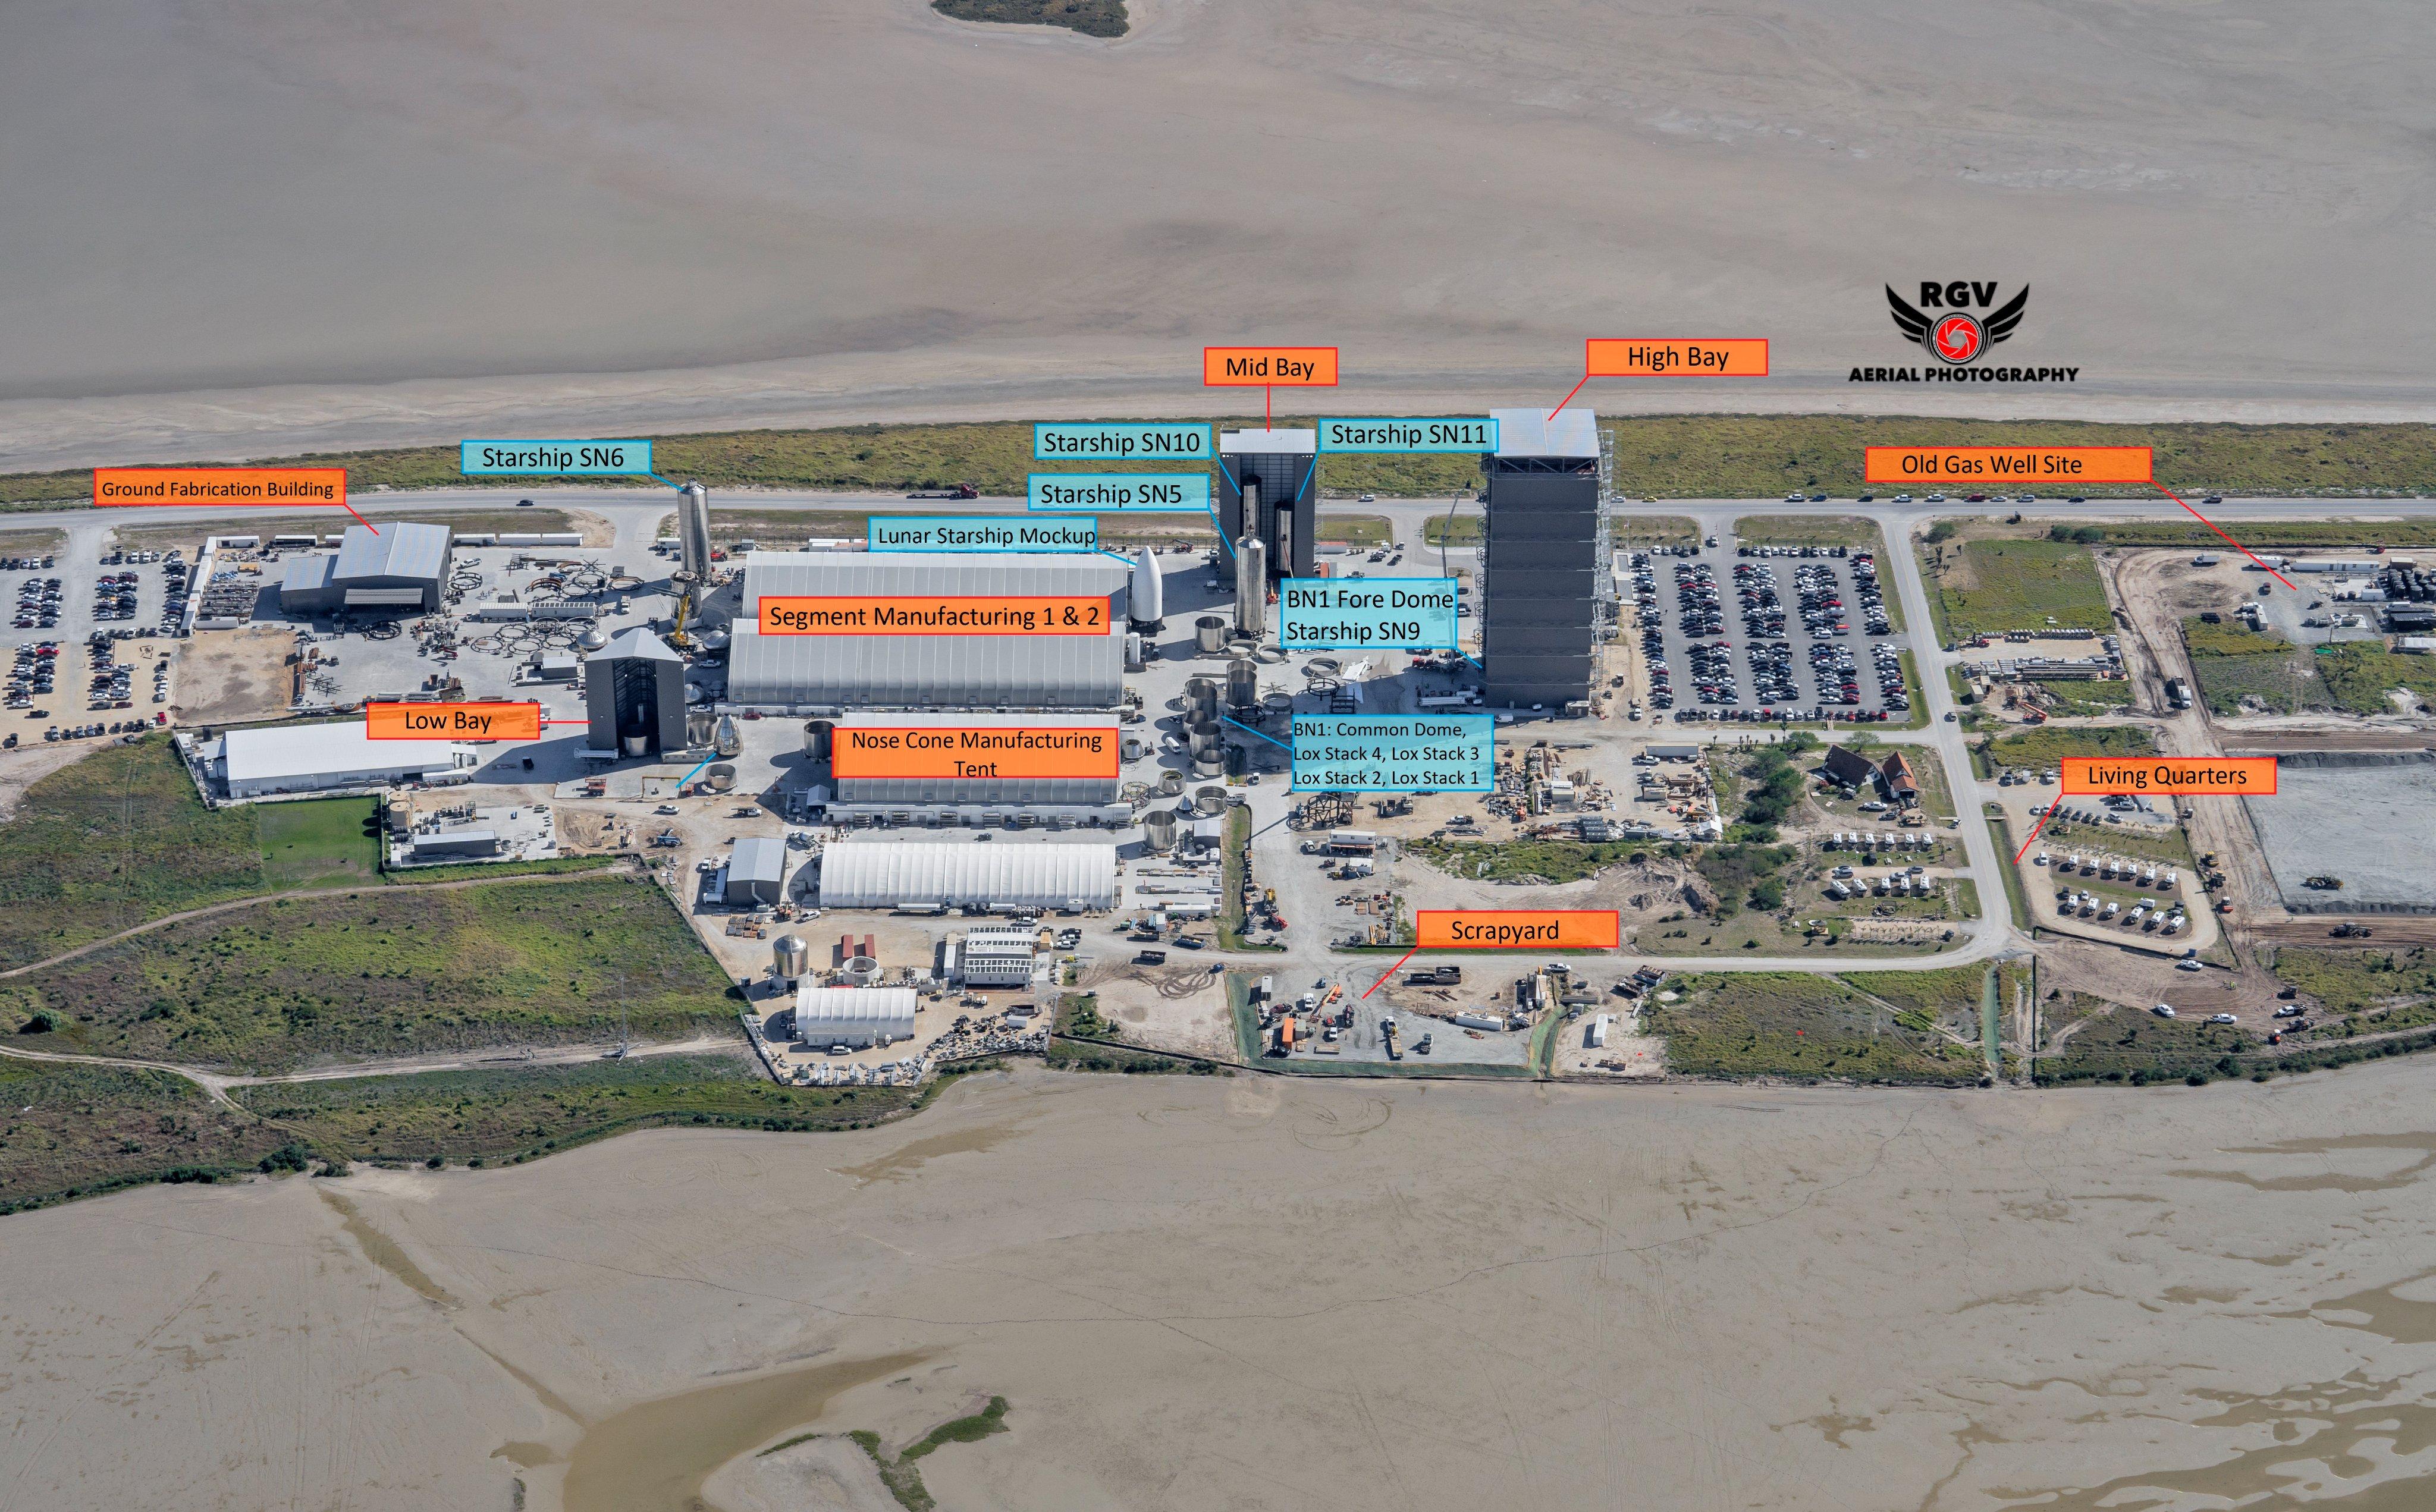 Site de lancement de Boca Chica au Texas - Page 21 EpS9NwxWEAAqRU3?format=jpg&name=4096x4096